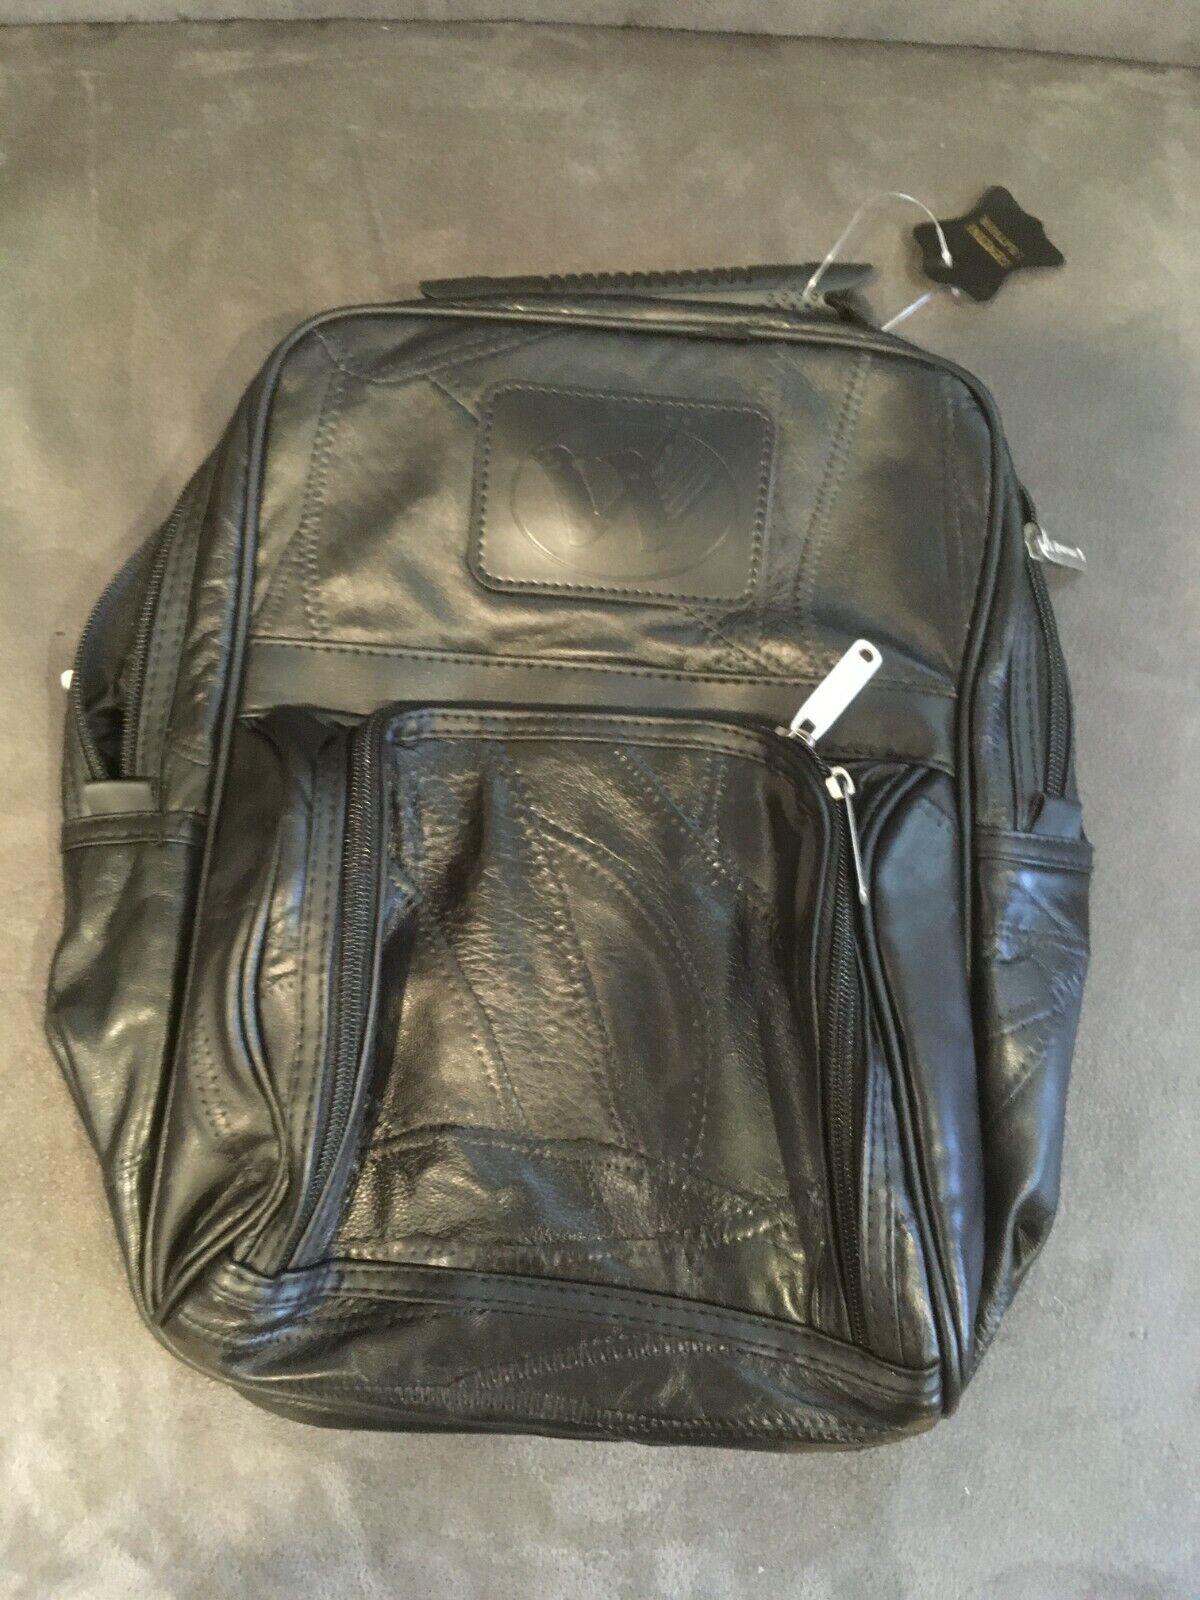 Seville Gear Shoe Caddy Storage Bag - Black Leather